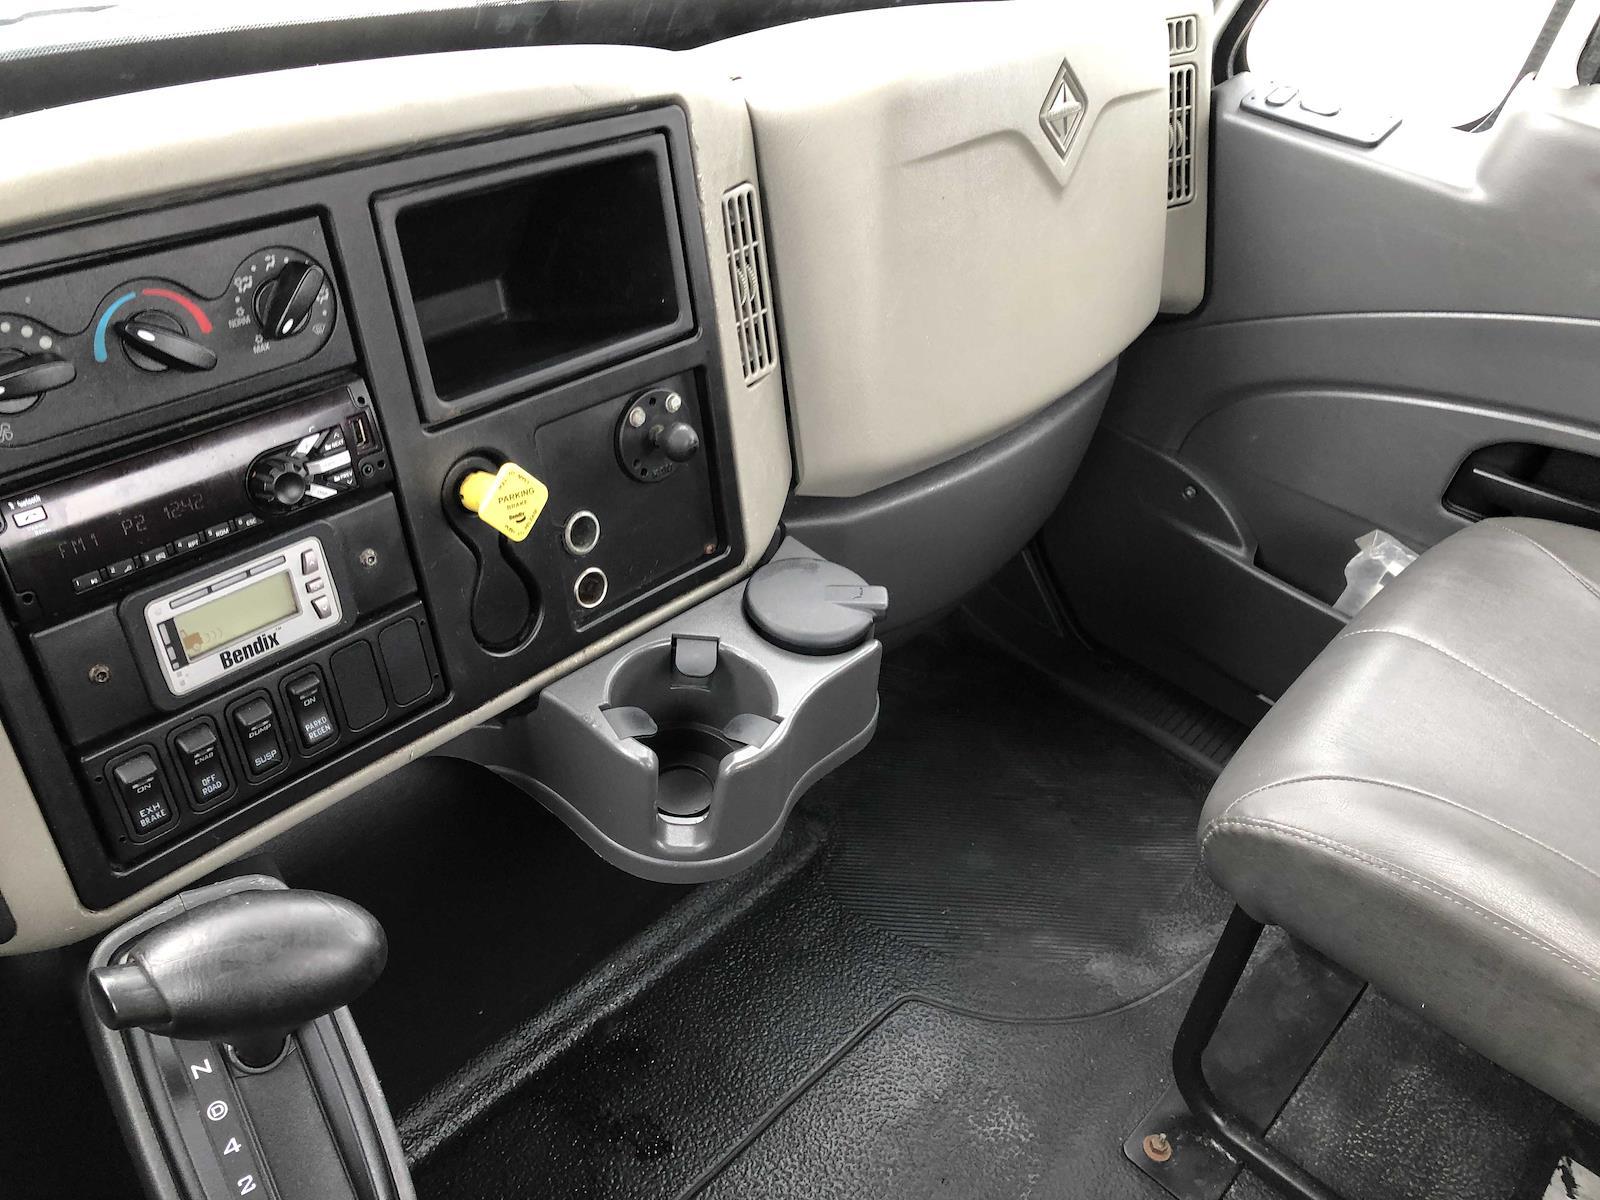 2016 International DuraStar 4300 4x2, Cab Chassis #I-8629 - photo 16